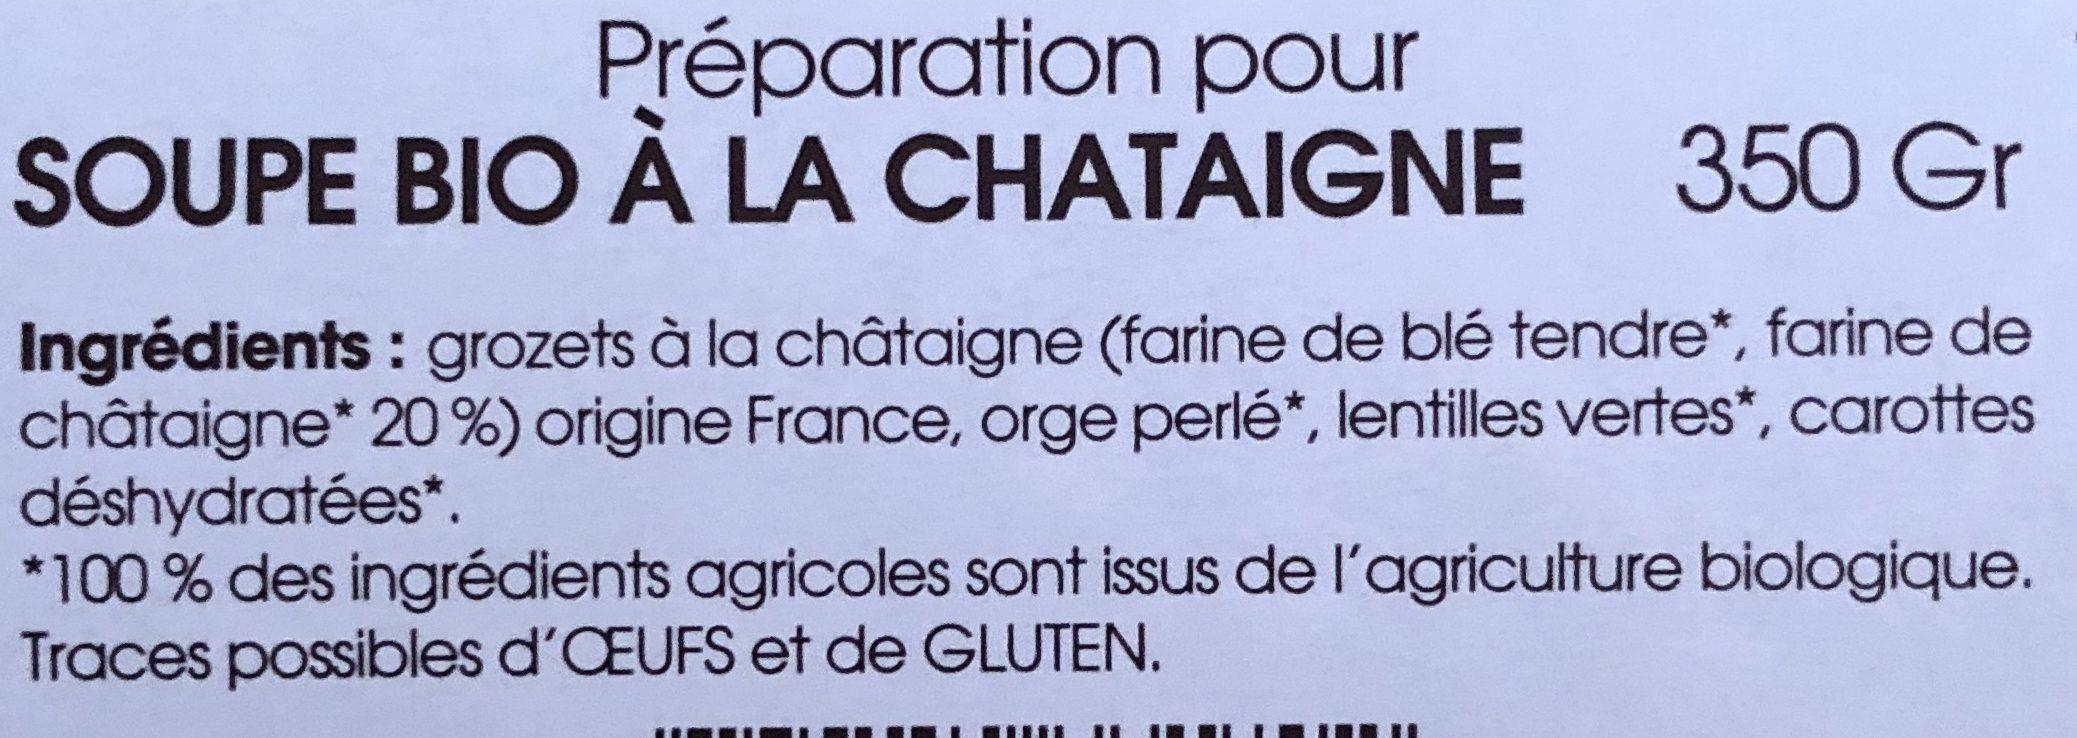 Soupe bio à la châtaigne - Ingrediënten - fr